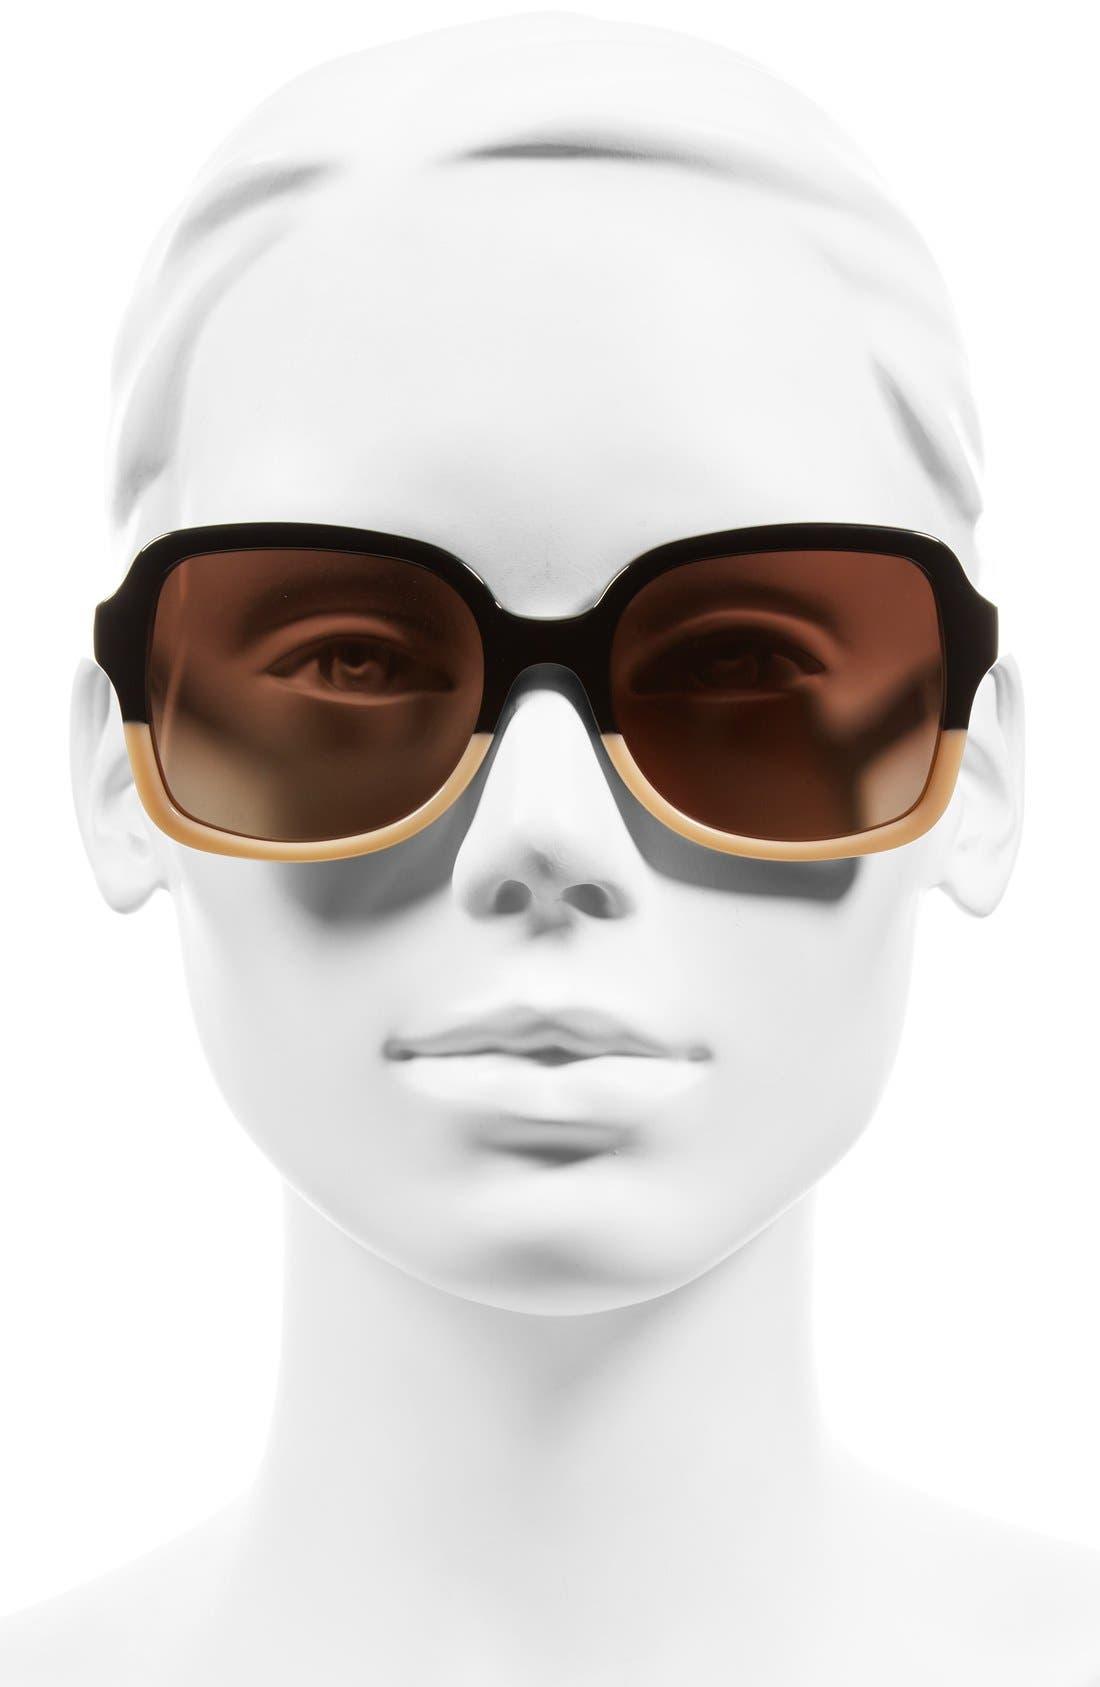 55mm Polarized Sunglasses,                             Alternate thumbnail 2, color,                             001